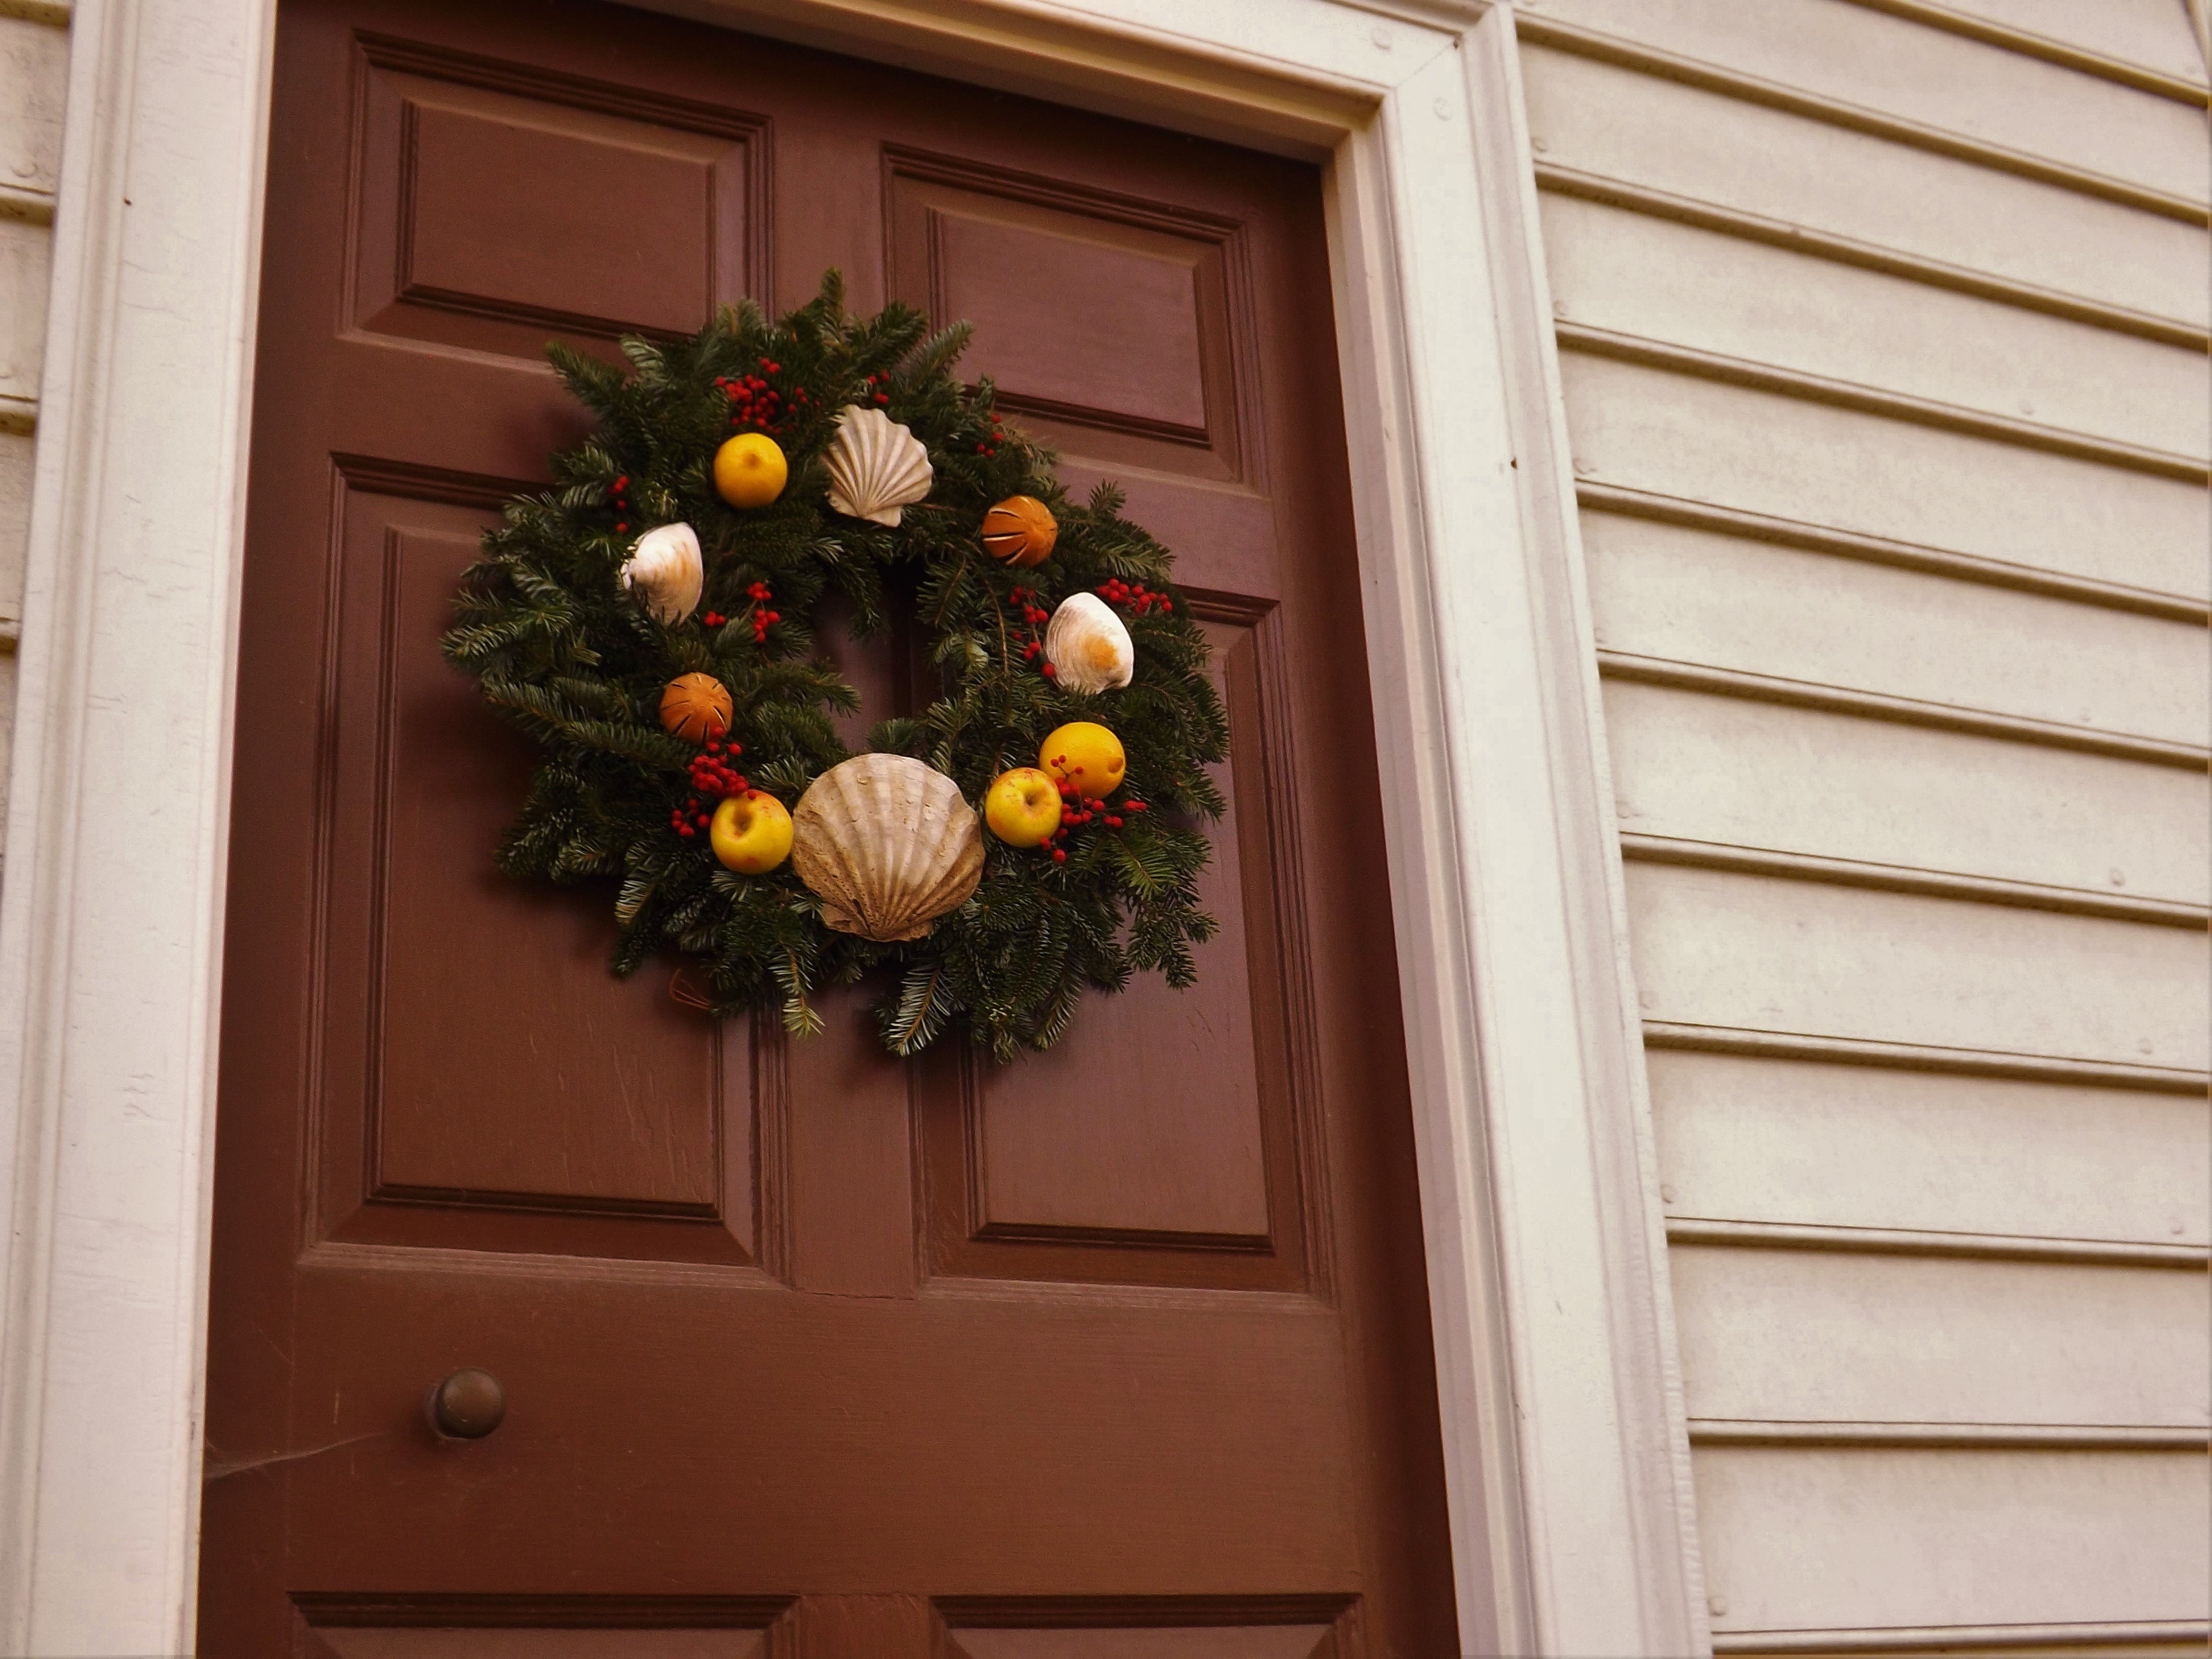 Williamsburg christmas decorations 1h worldsmith for H h christmas decorations